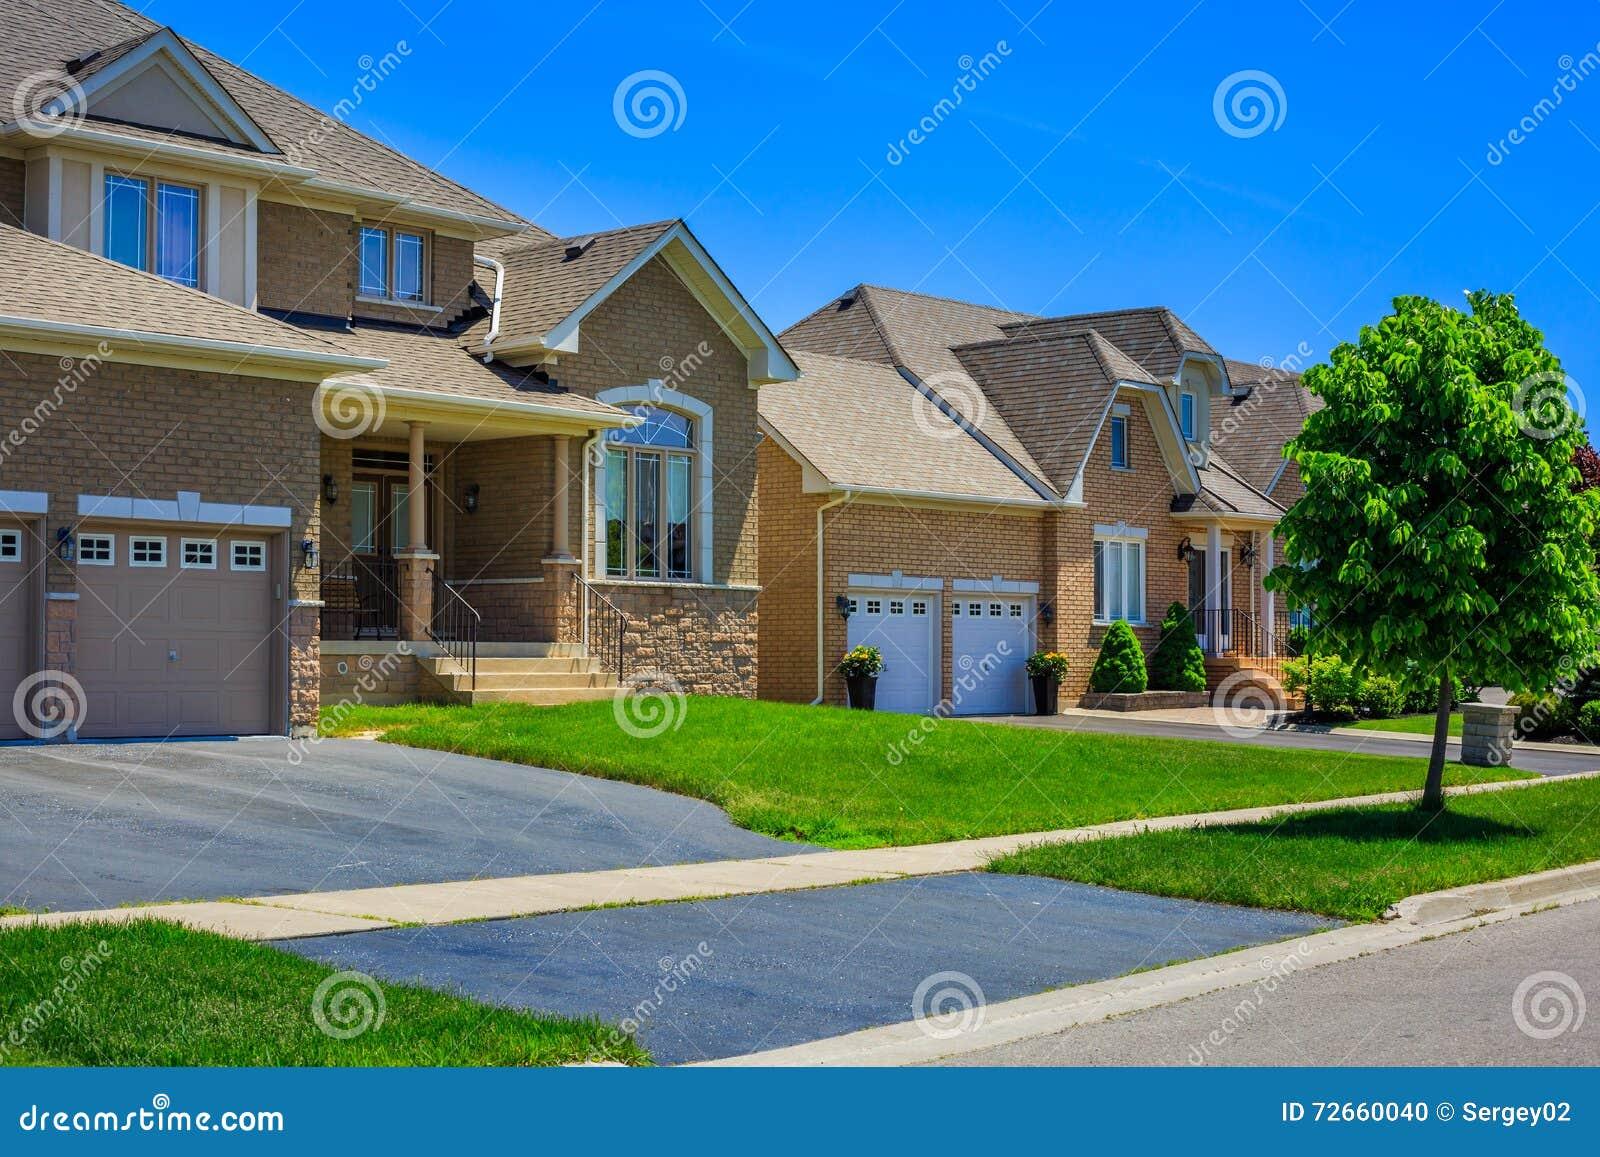 Luxury Houses In North America Stock Photo Image 72660040